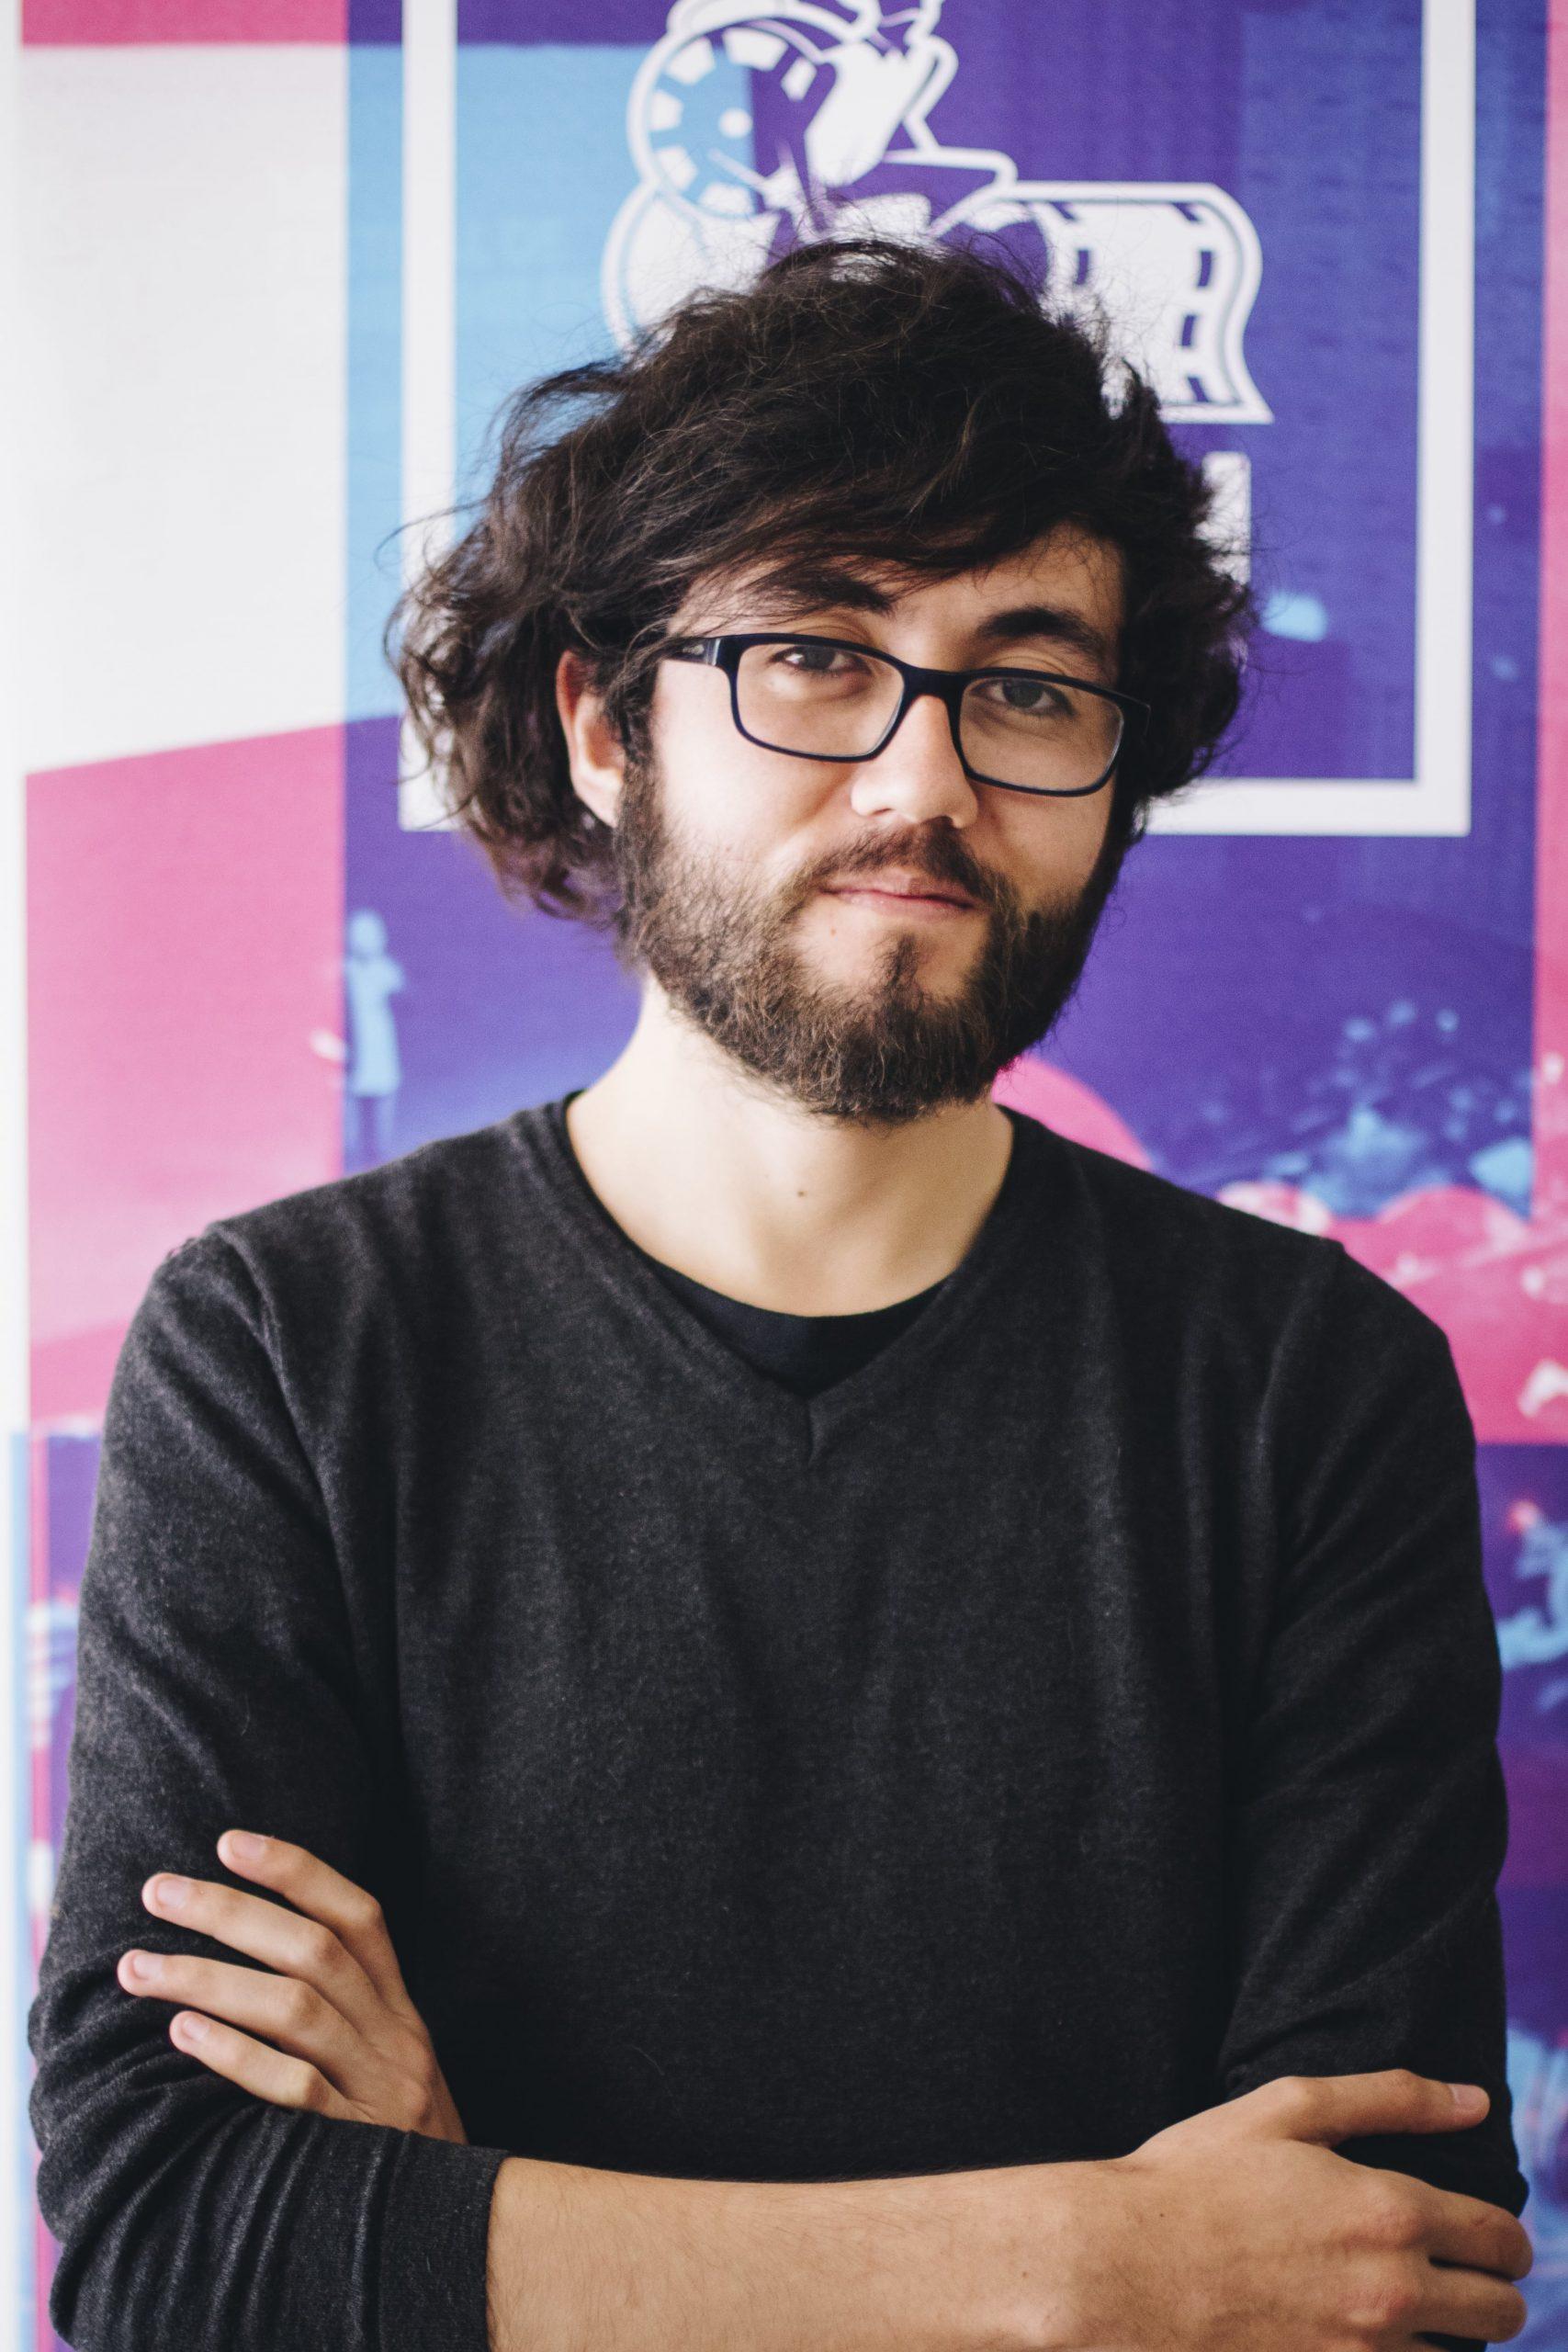 Gustavo Abarca